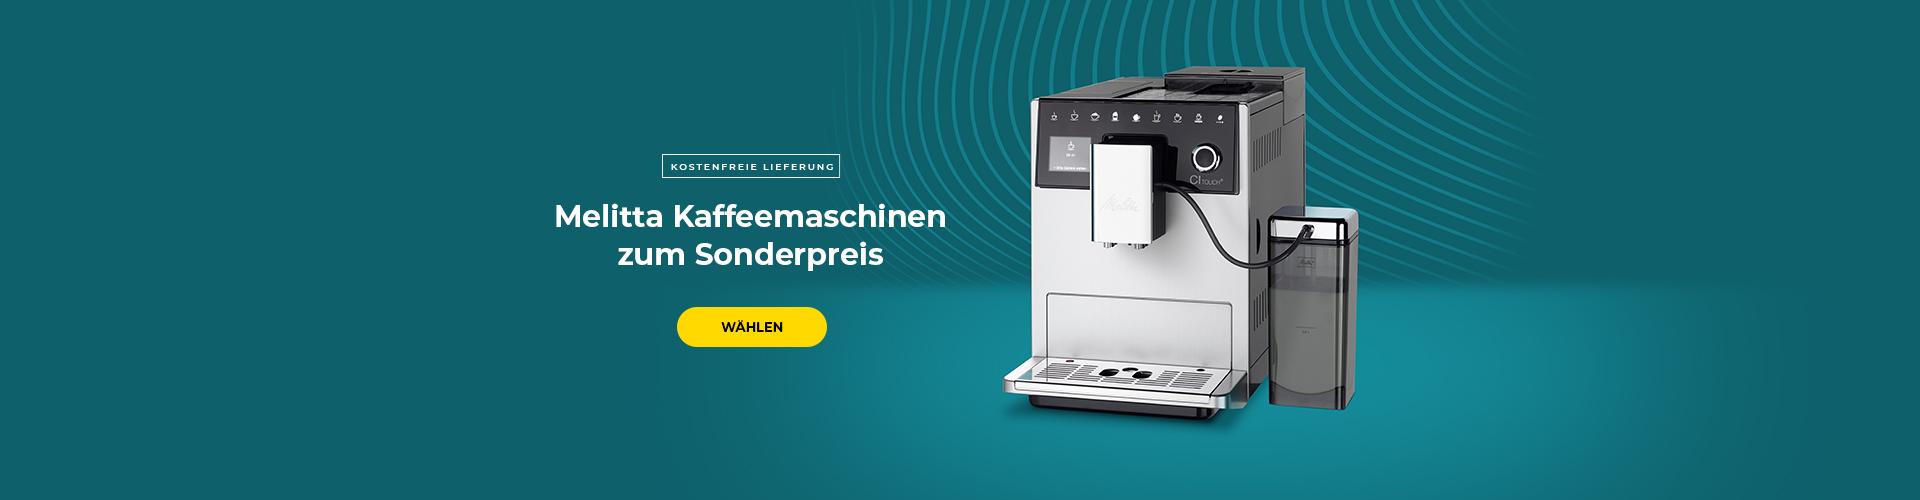 Melitta Kaffeemaschinen zum Sonderpreis